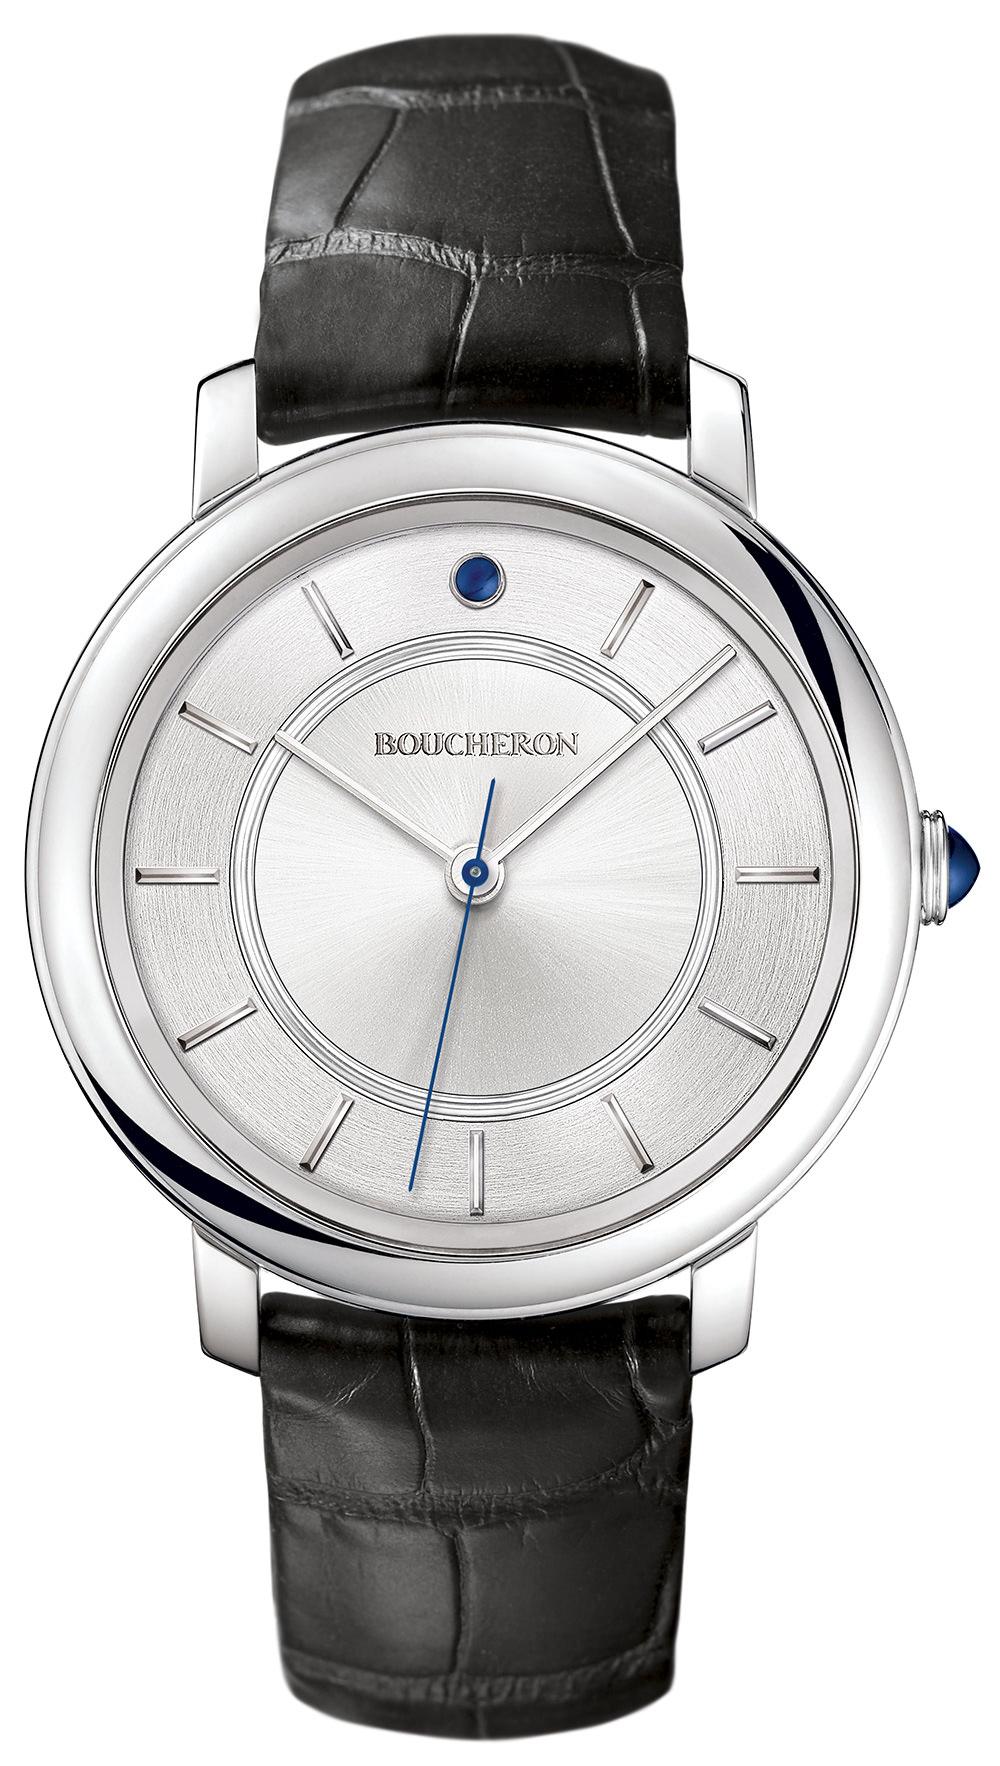 Reloj Epure Boucheron en oro blanco y 42mm